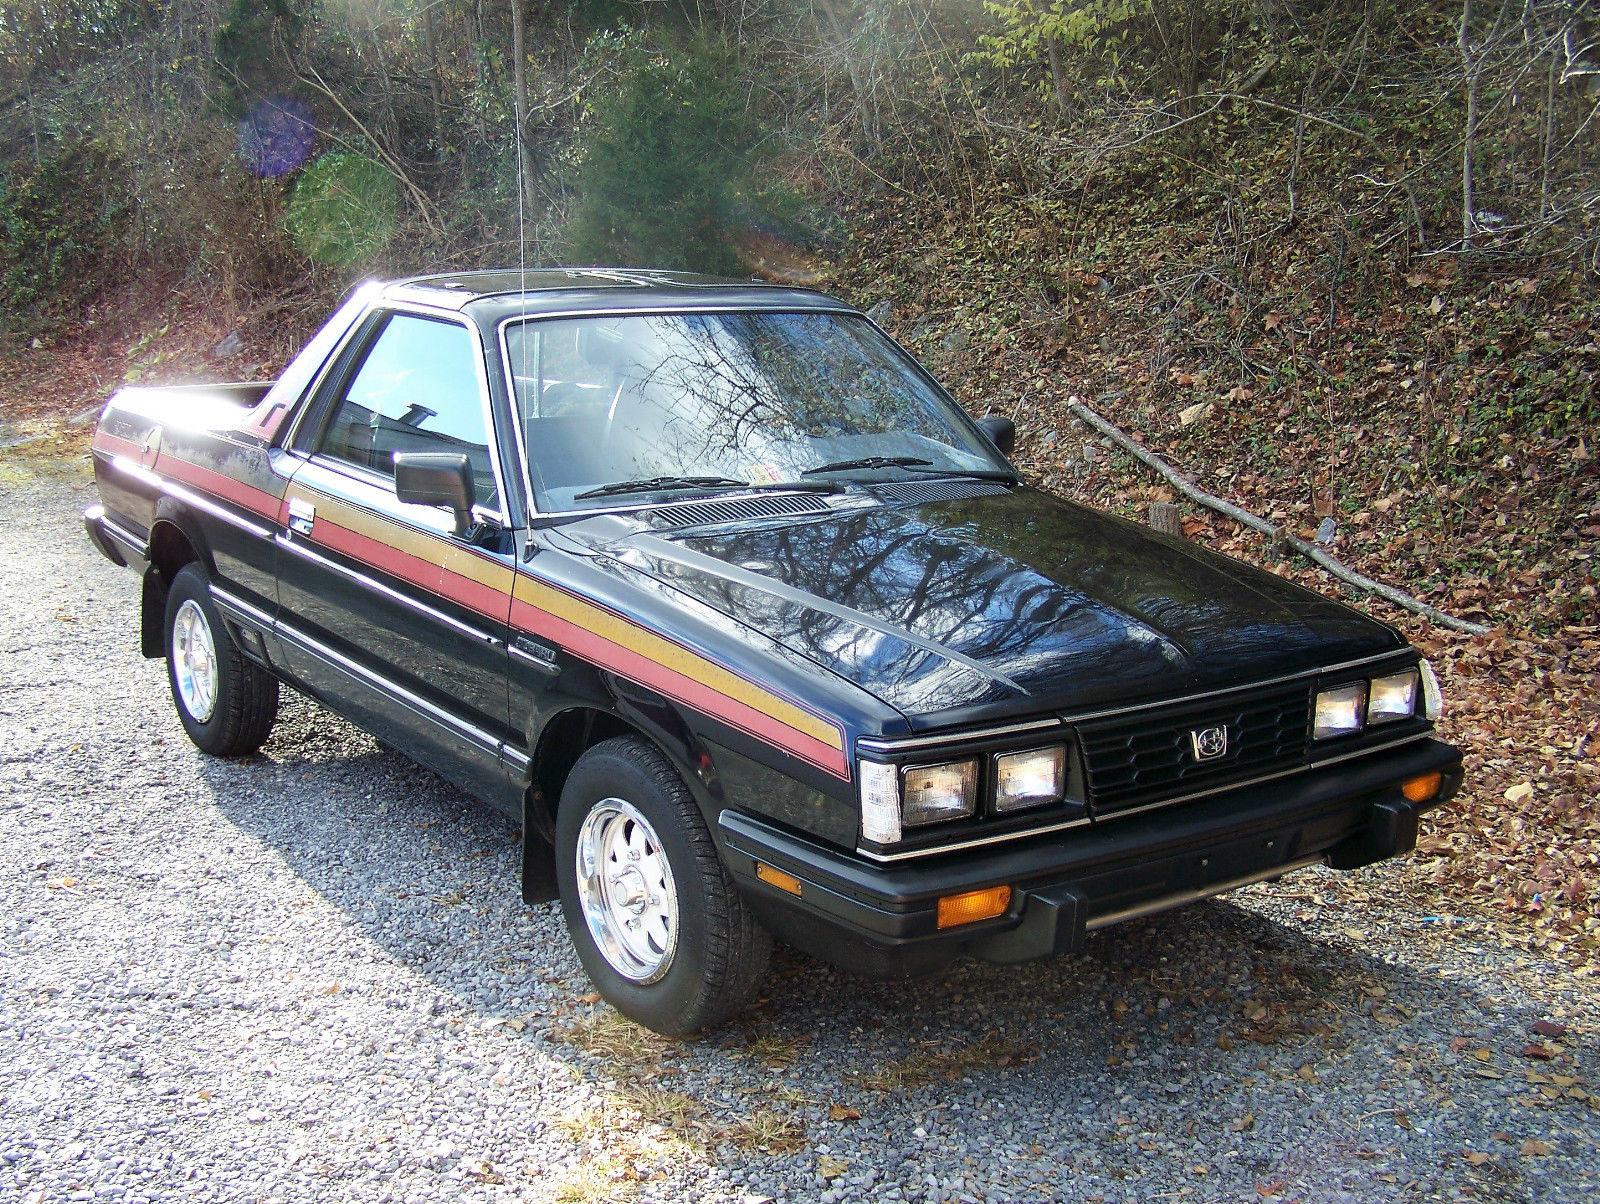 1984 Subaru Brat Gl 4x4 Low Mileage Survivor